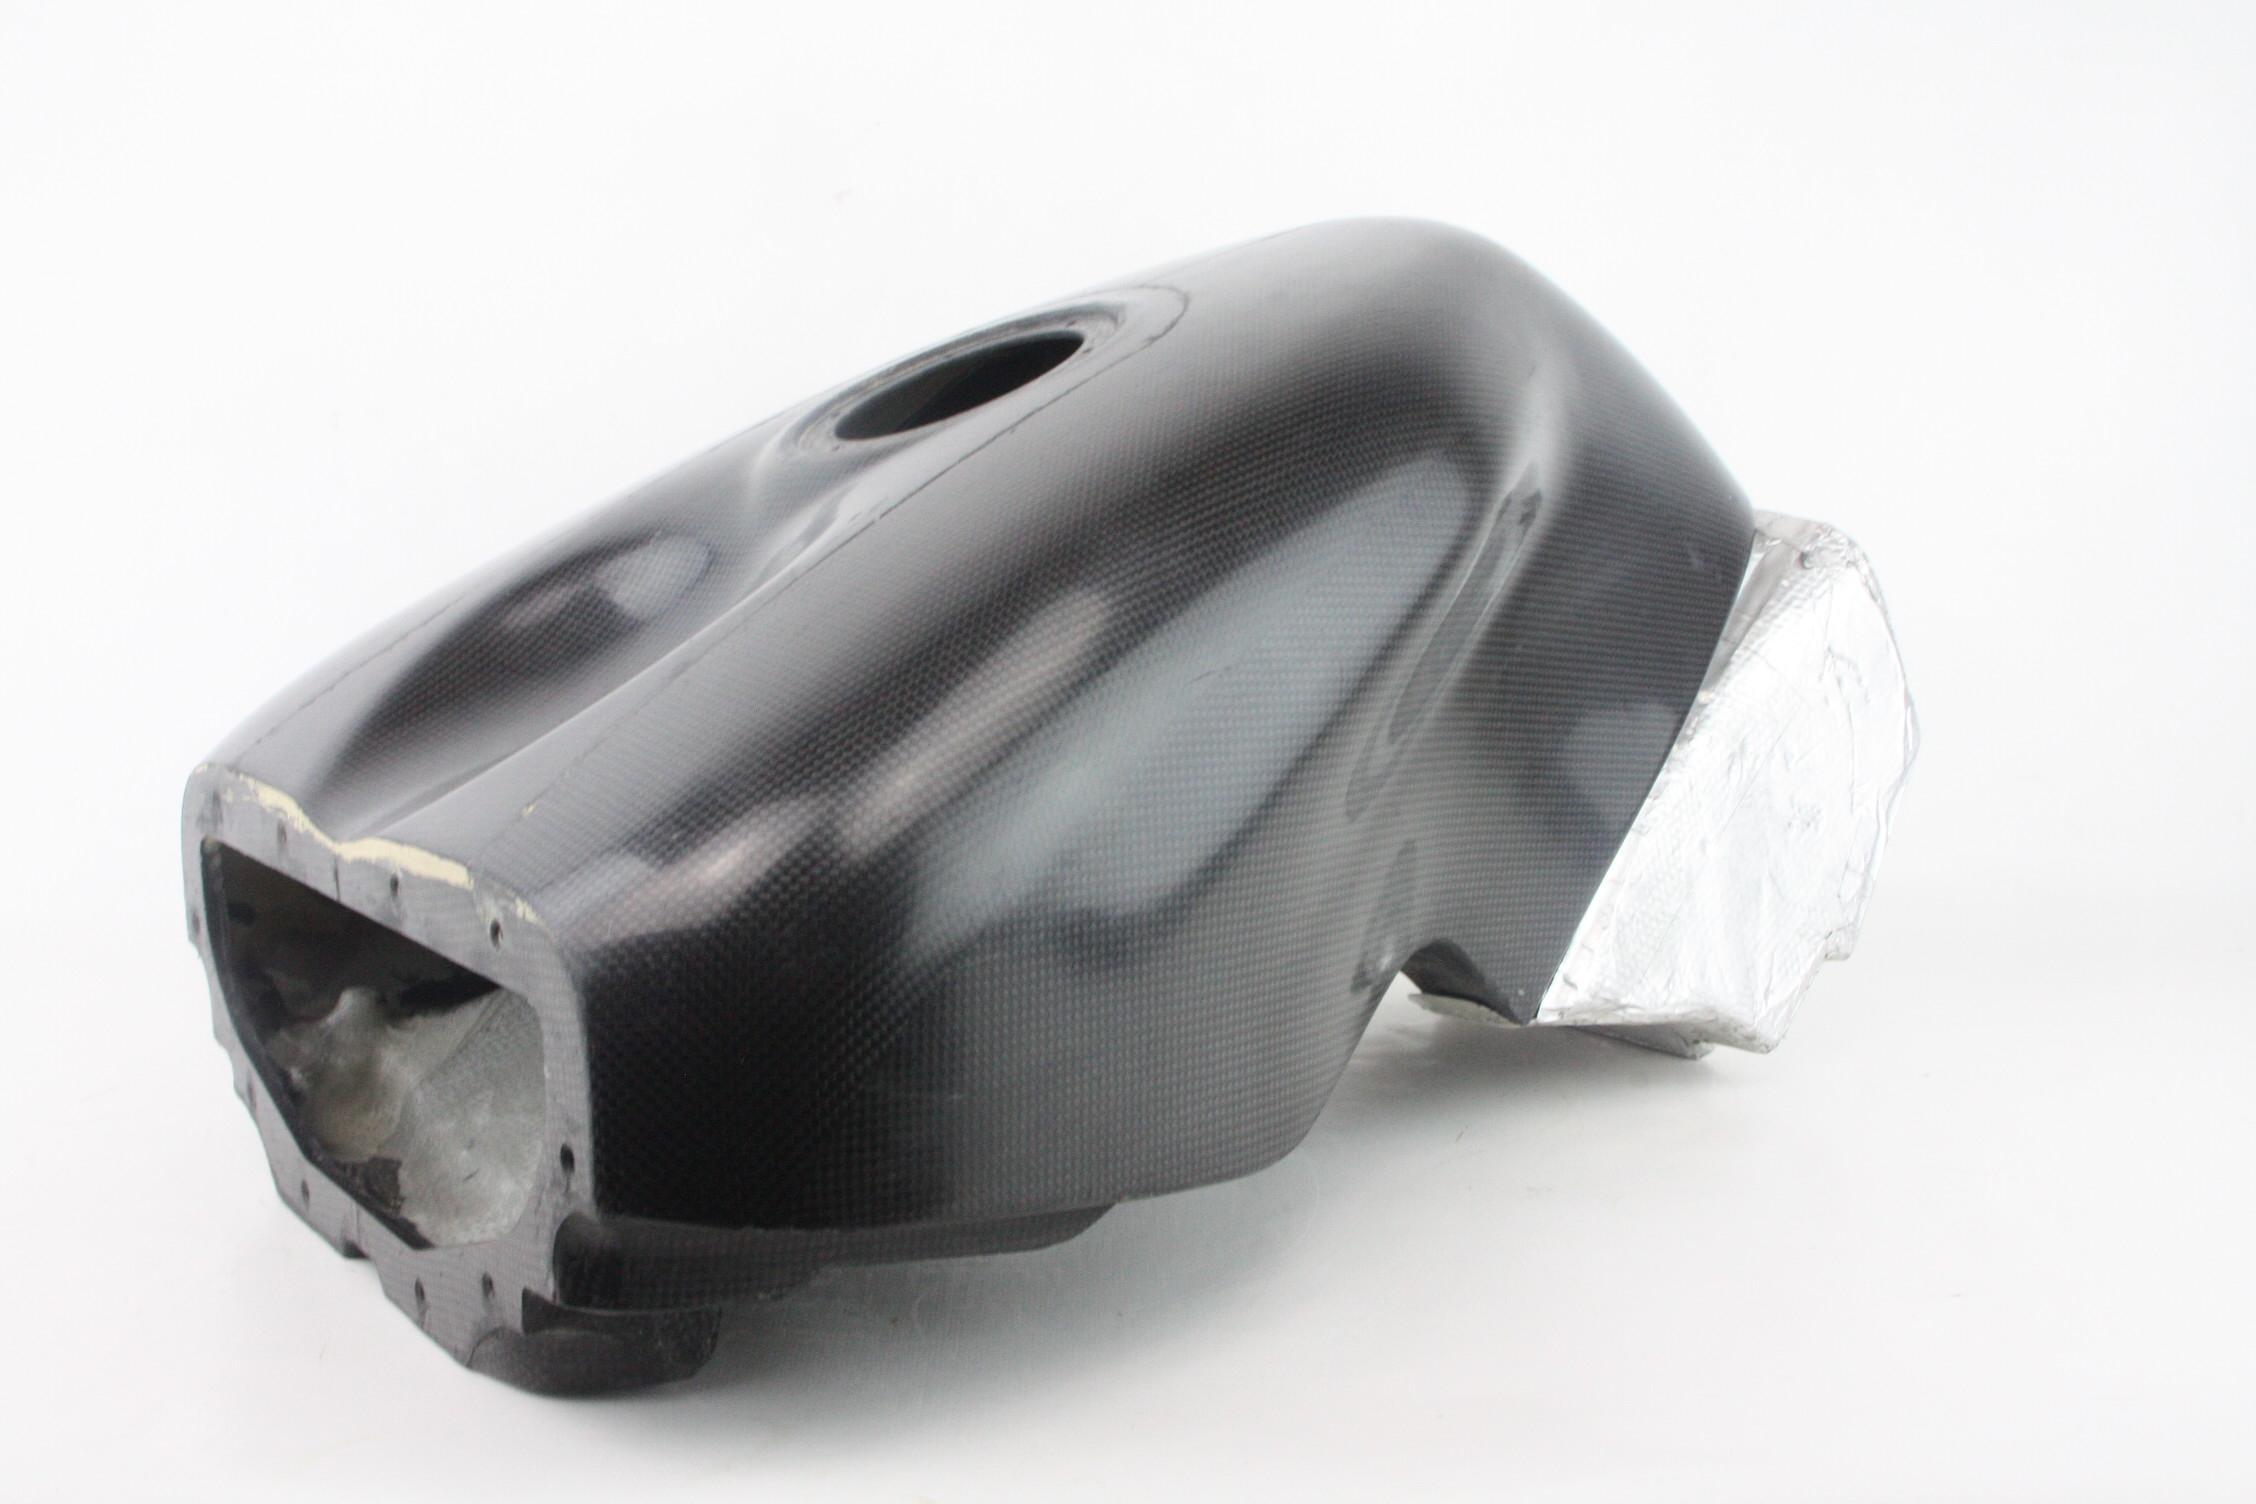 Ducati corse carbon fiber gas fuel tank Ducati desmosedici GP5 official MotoGP